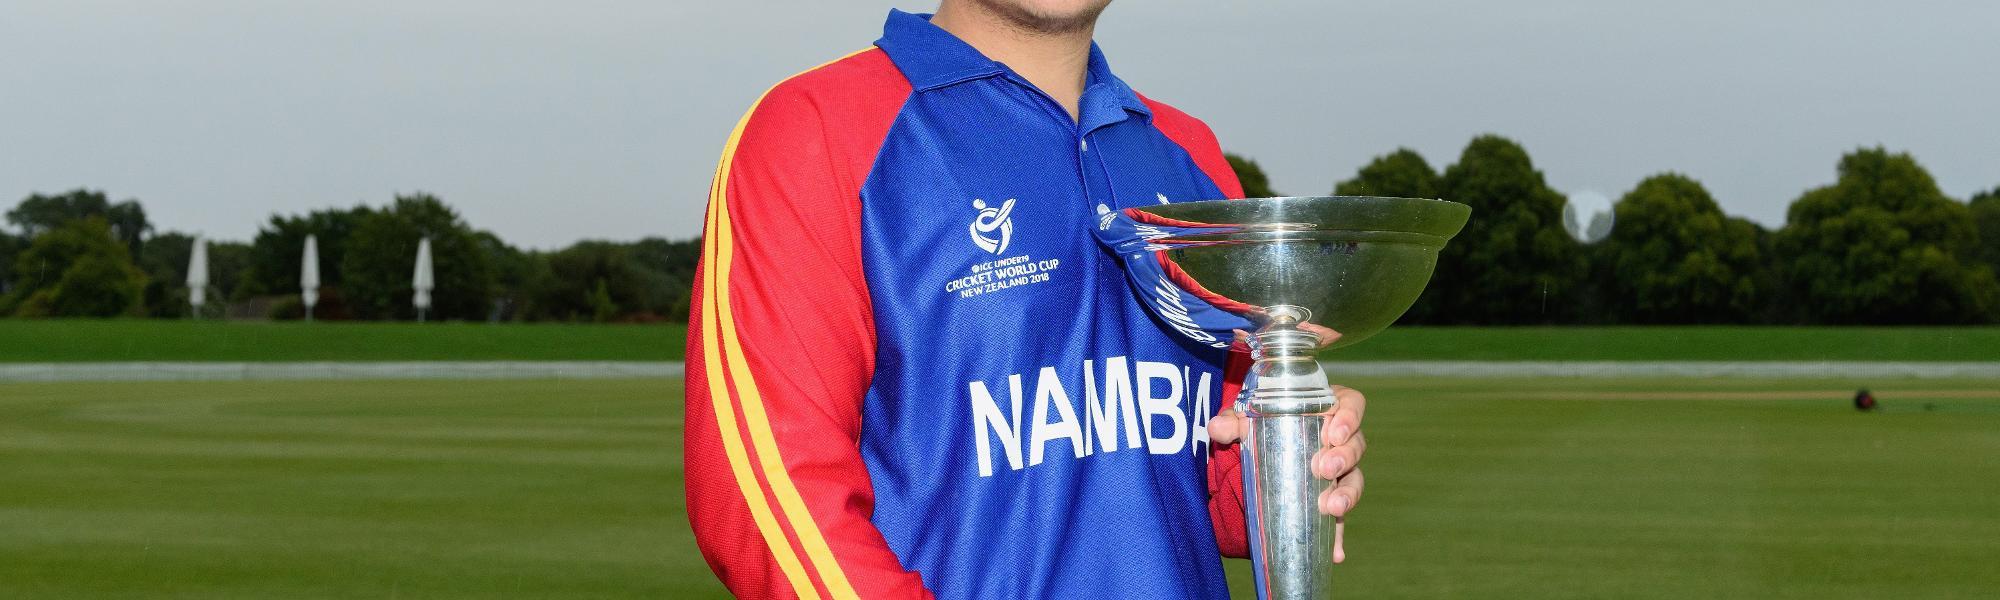 Namibia U19s - Nicol Loftie-Eaton